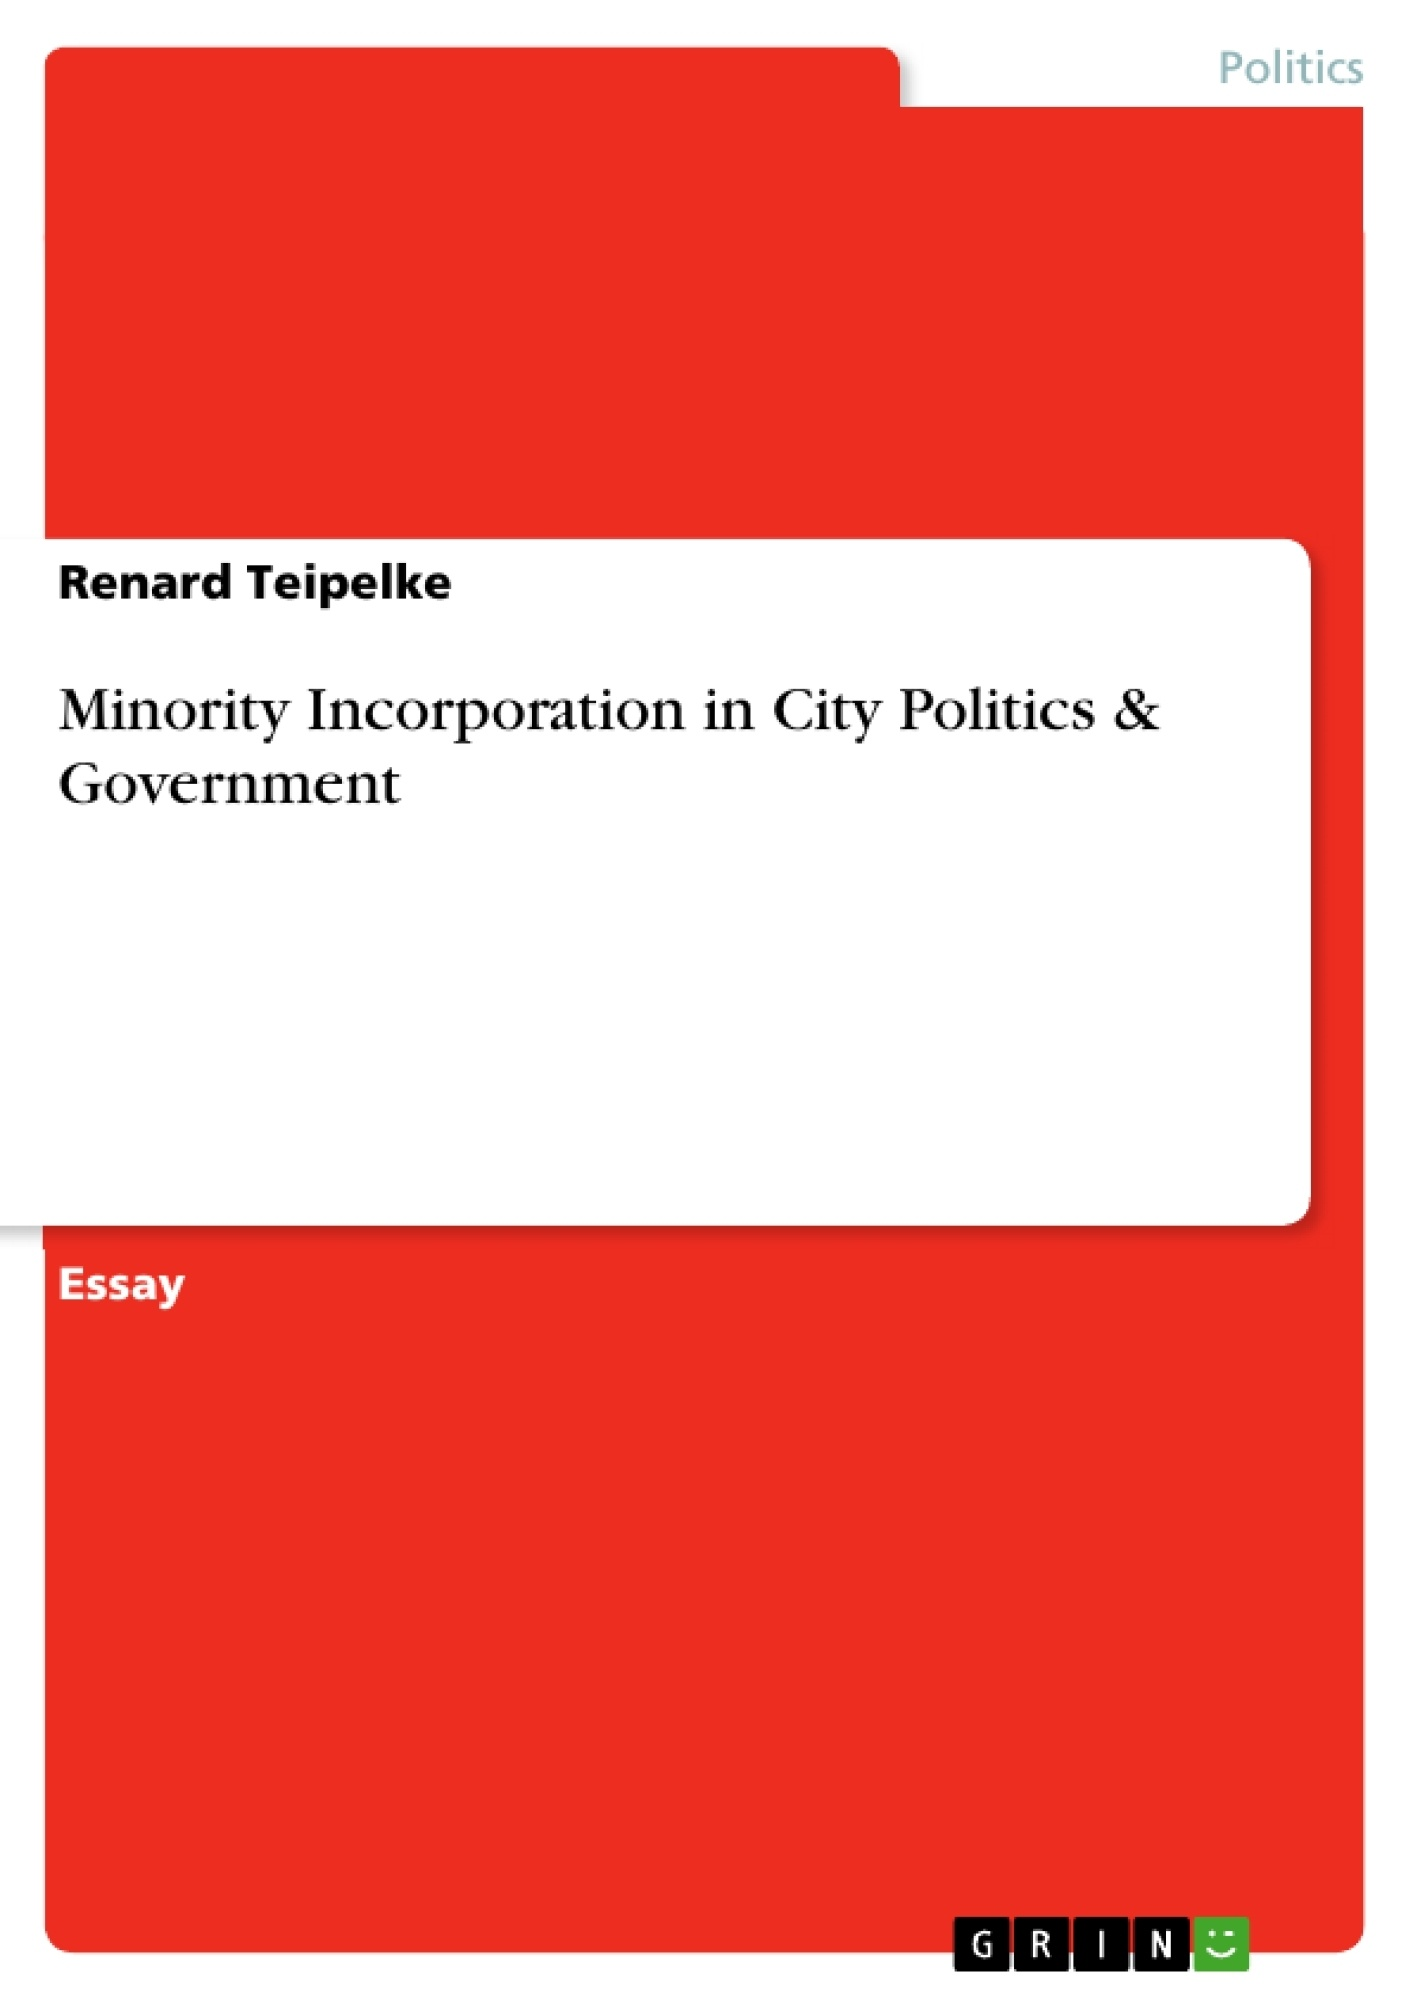 Title: Minority Incorporation in City Politics & Government